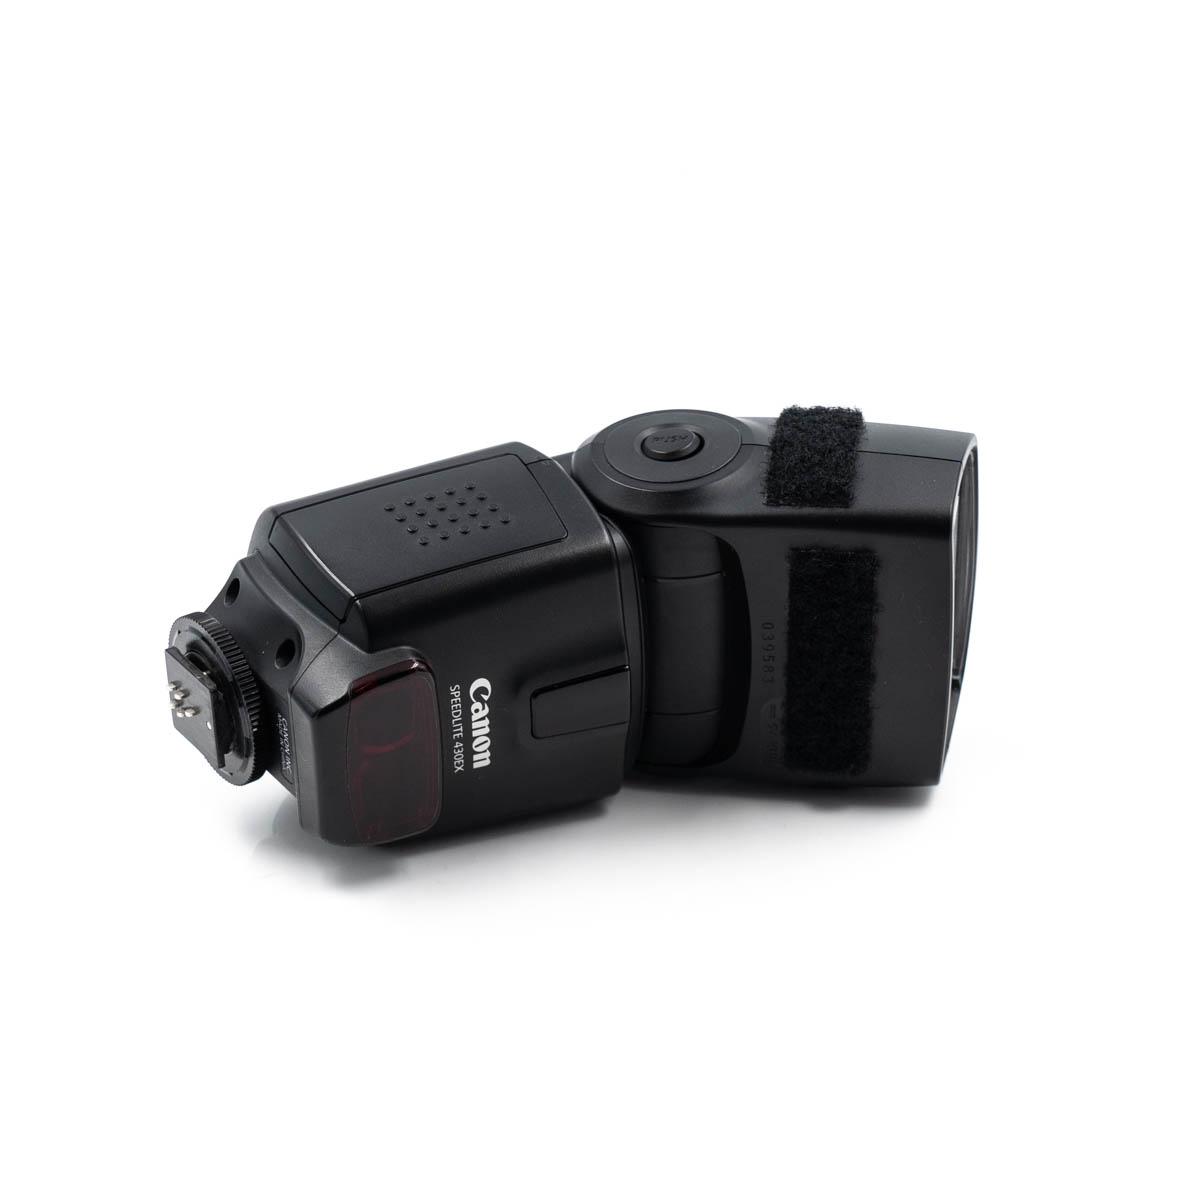 canon 430ex 2